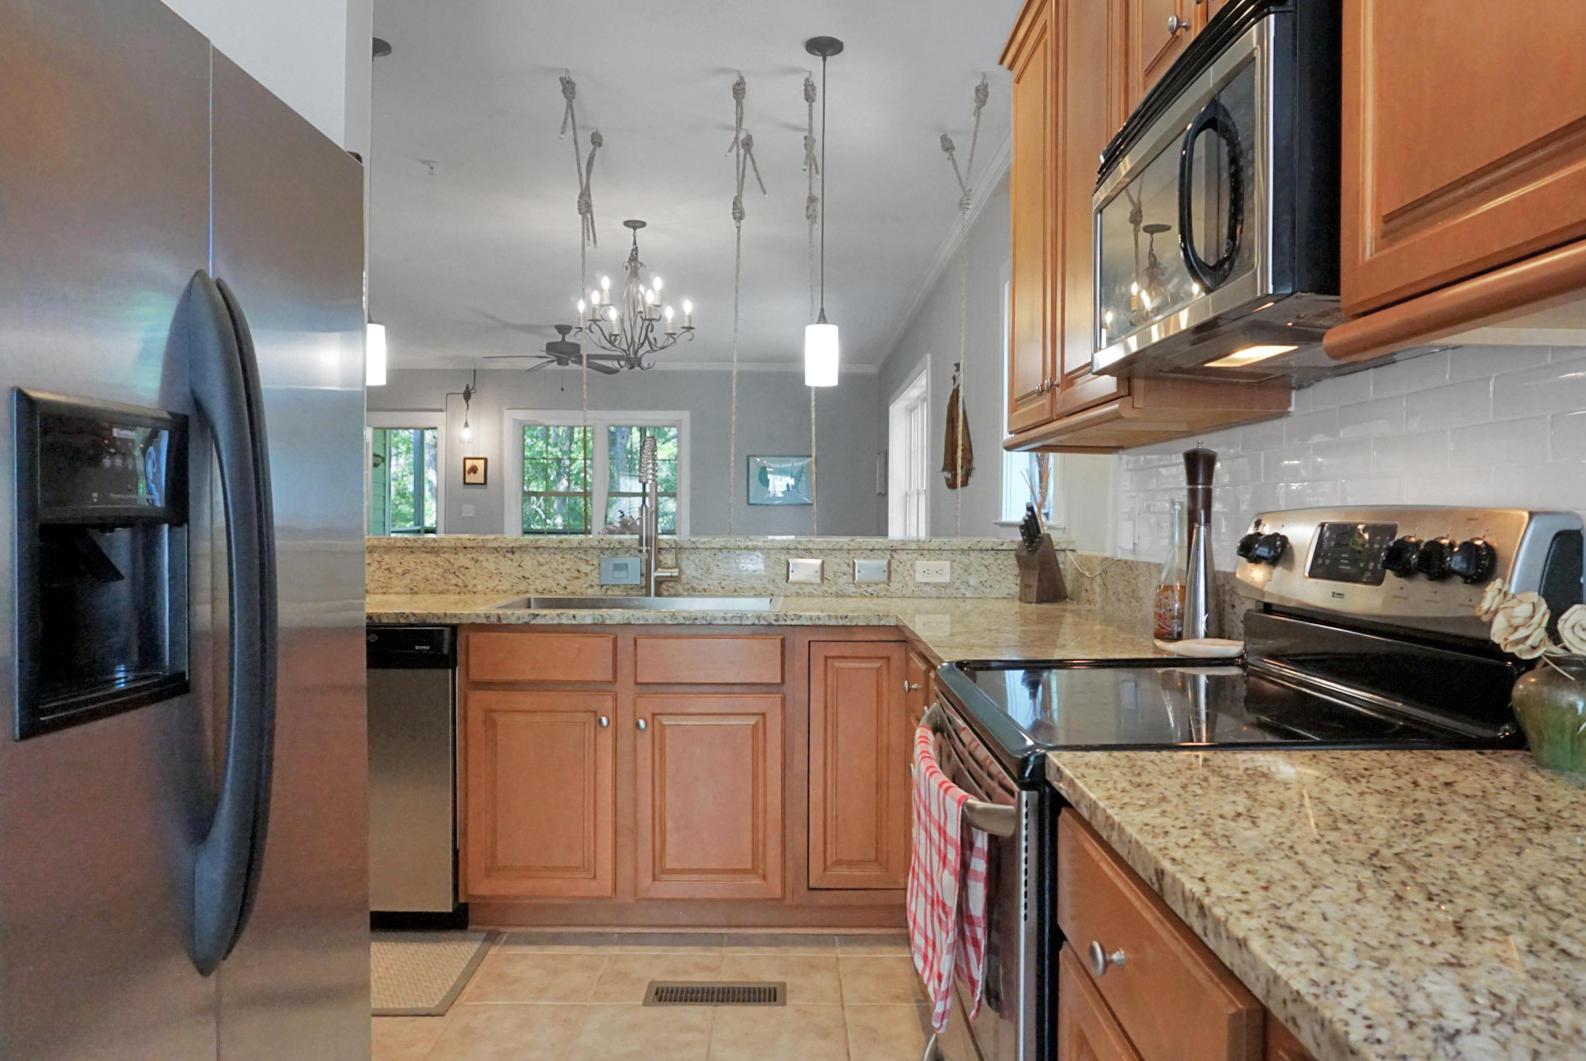 Etiwan Pointe Homes For Sale - 269 Etiwan Pointe, Mount Pleasant, SC - 59